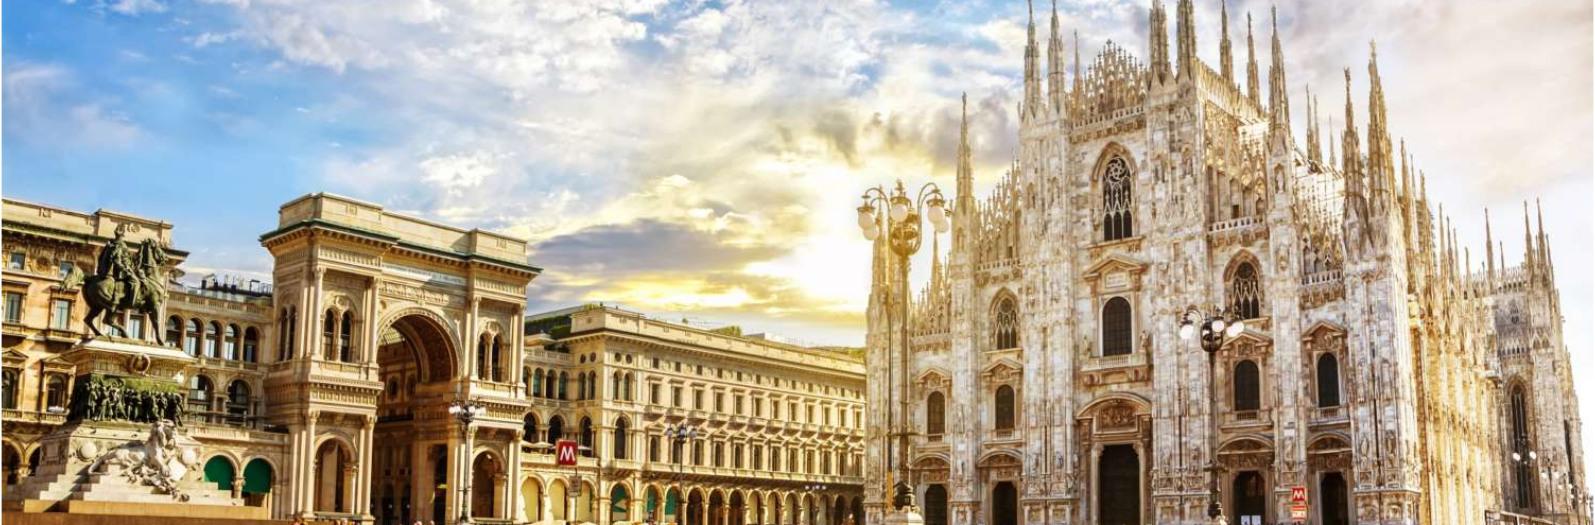 La Scala Milán Adarve Travel